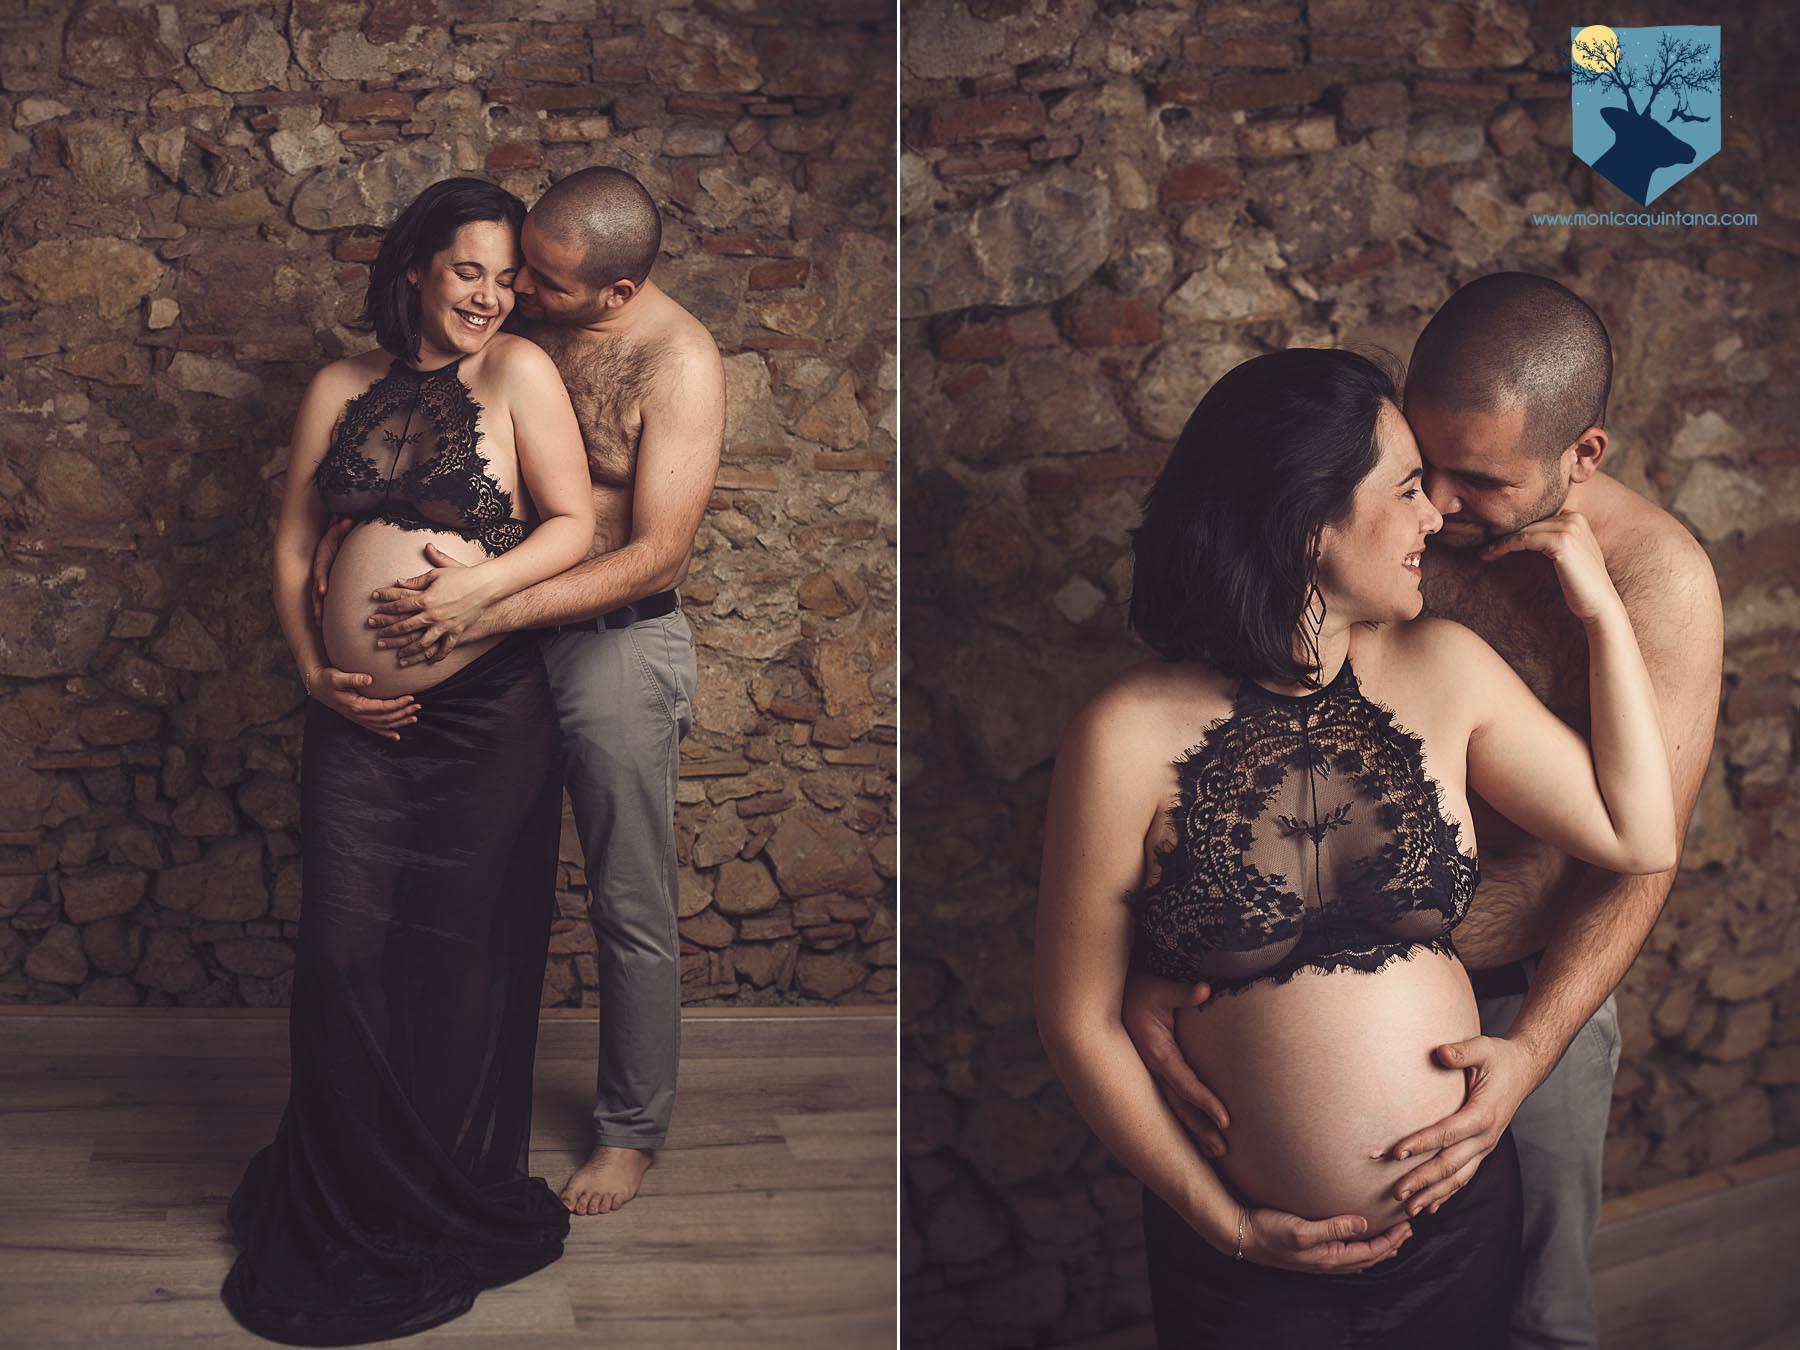 fotografia,girona,figueres,emporda,monica quintana,retrato,embarazo,embarazada,amor,pareja,familia,embaras,fotos,estudi